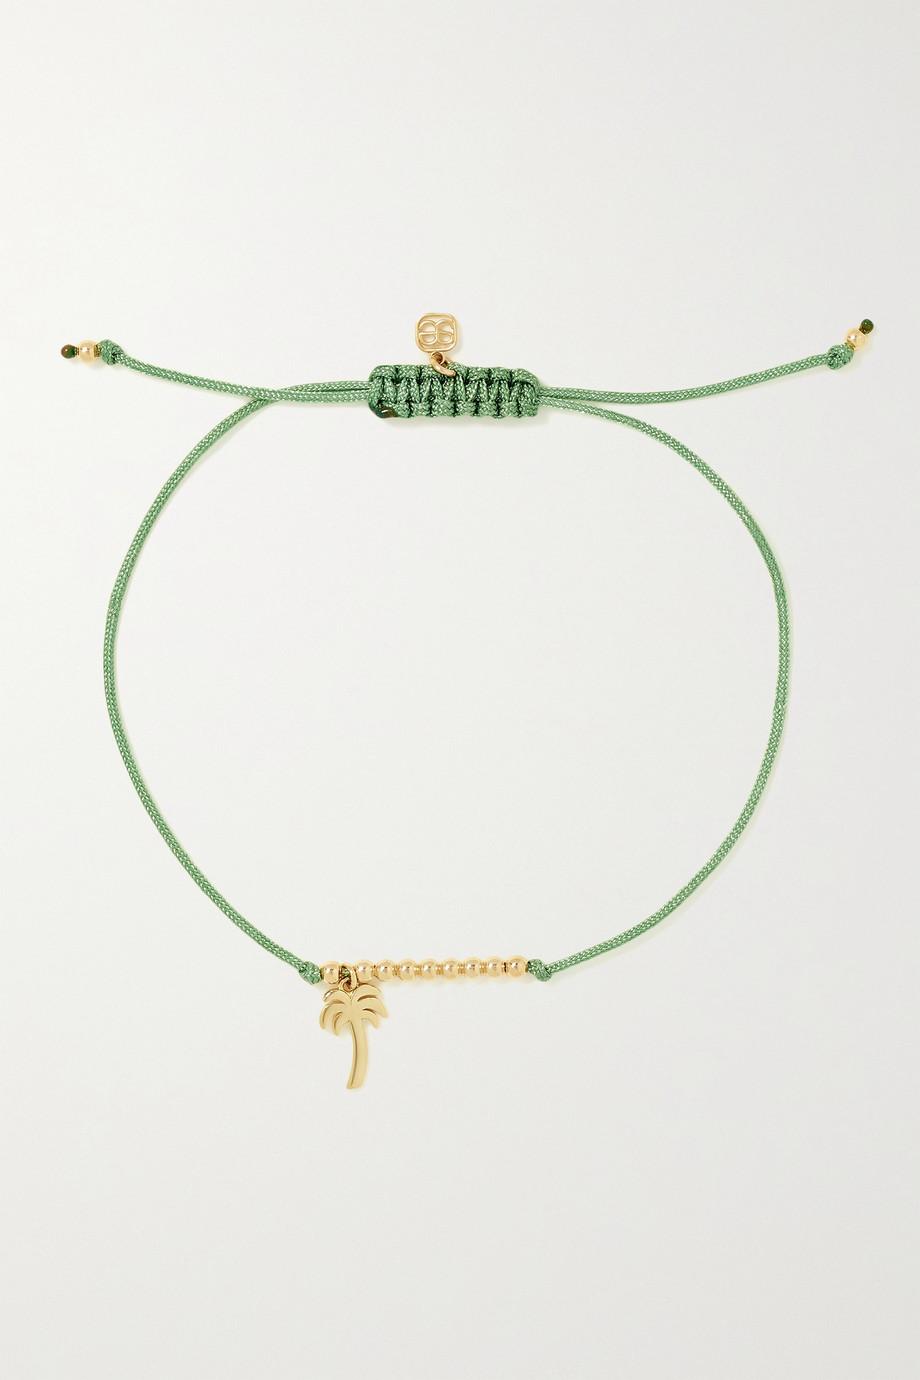 Sydney Evan Bracelet en or 14 carats (585/1000) et corde Palm Tree